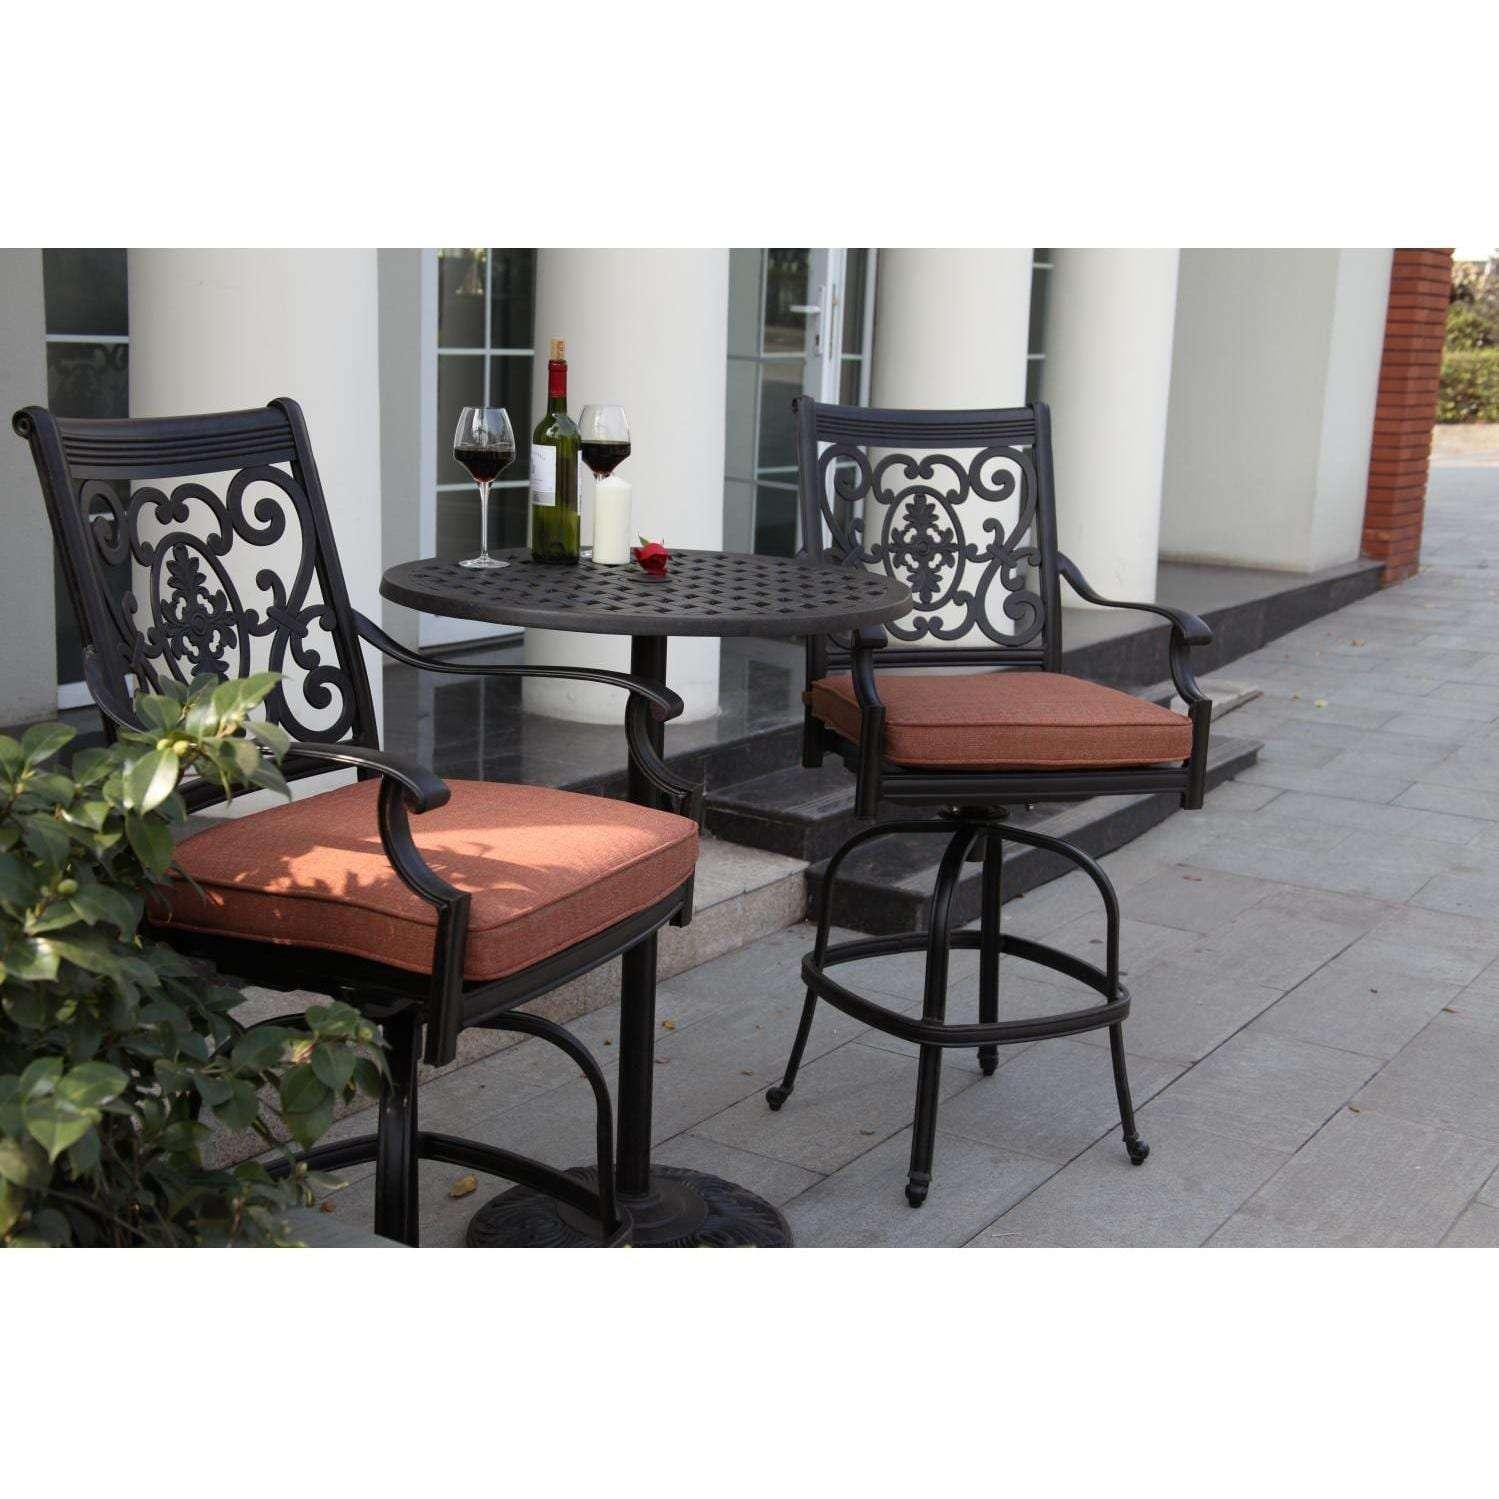 darlee st cruz 3 piece patio counter height bar set. Black Bedroom Furniture Sets. Home Design Ideas